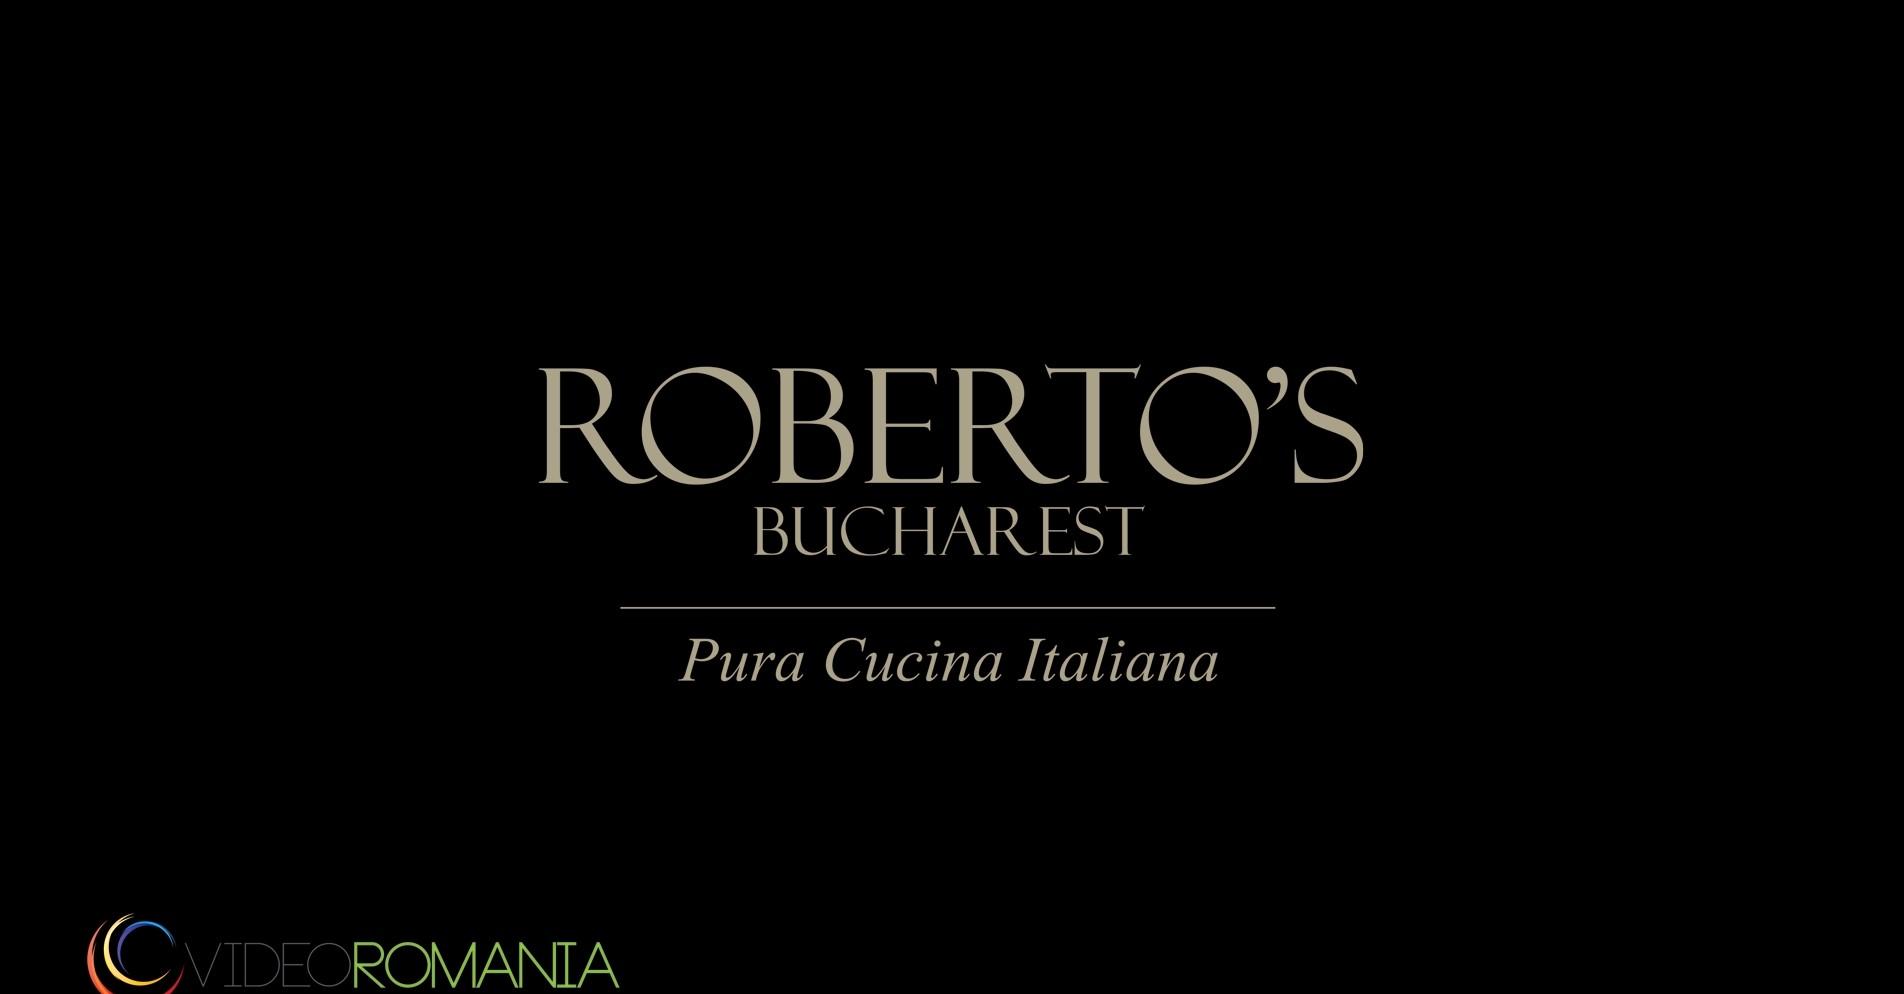 Restaurant ROBERTOS Bucharest